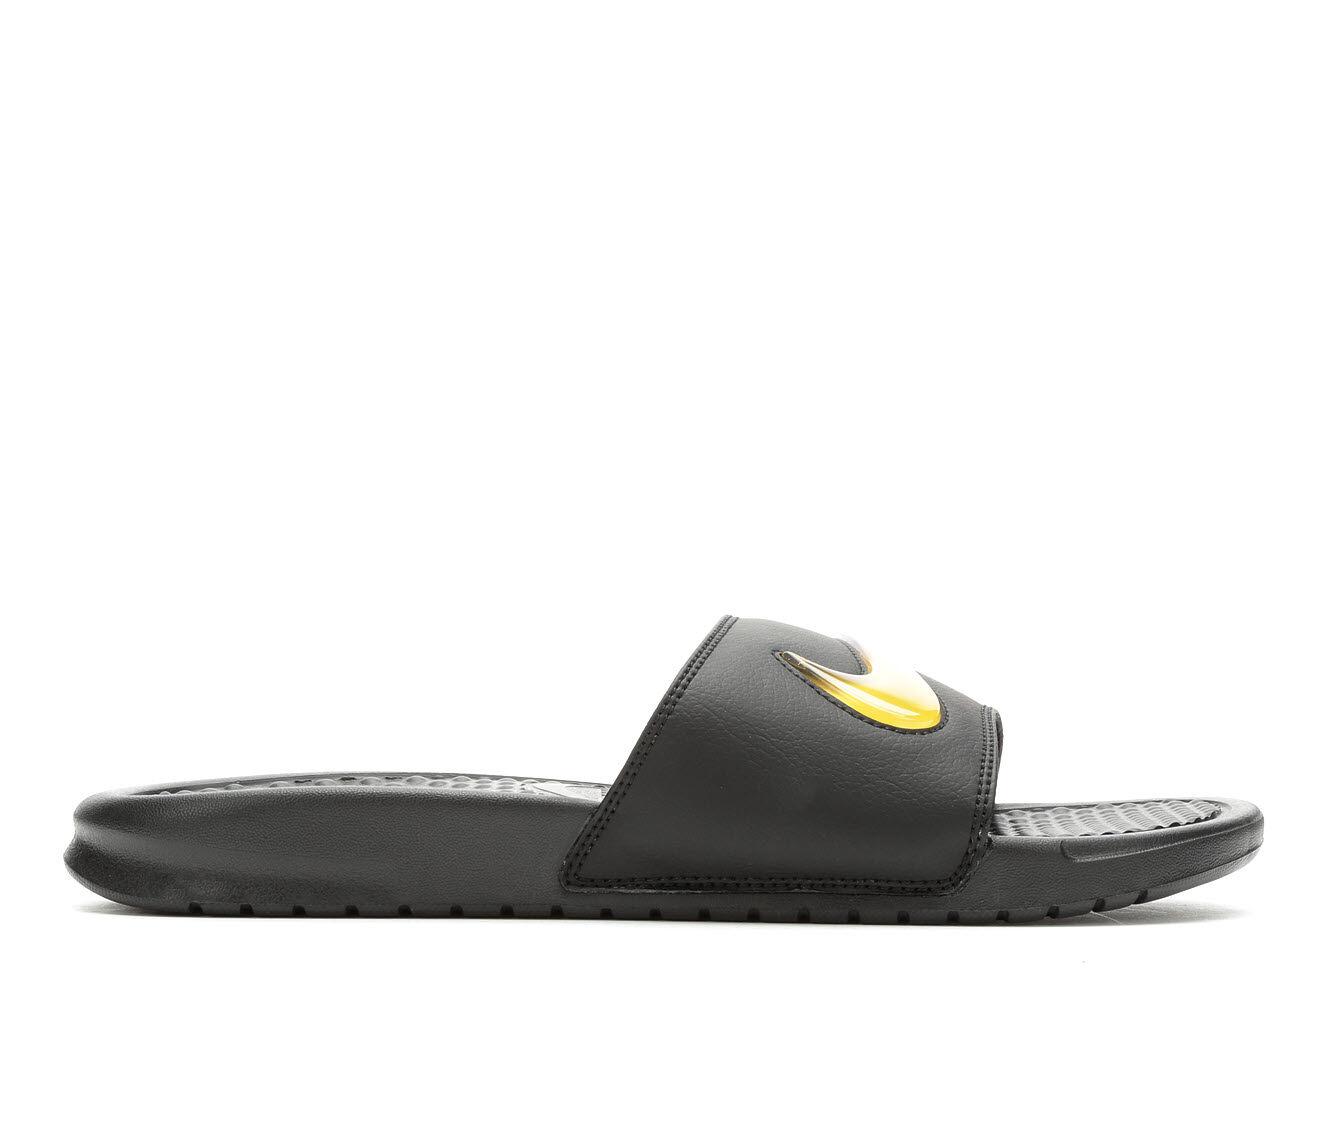 uk shoes_kd2608